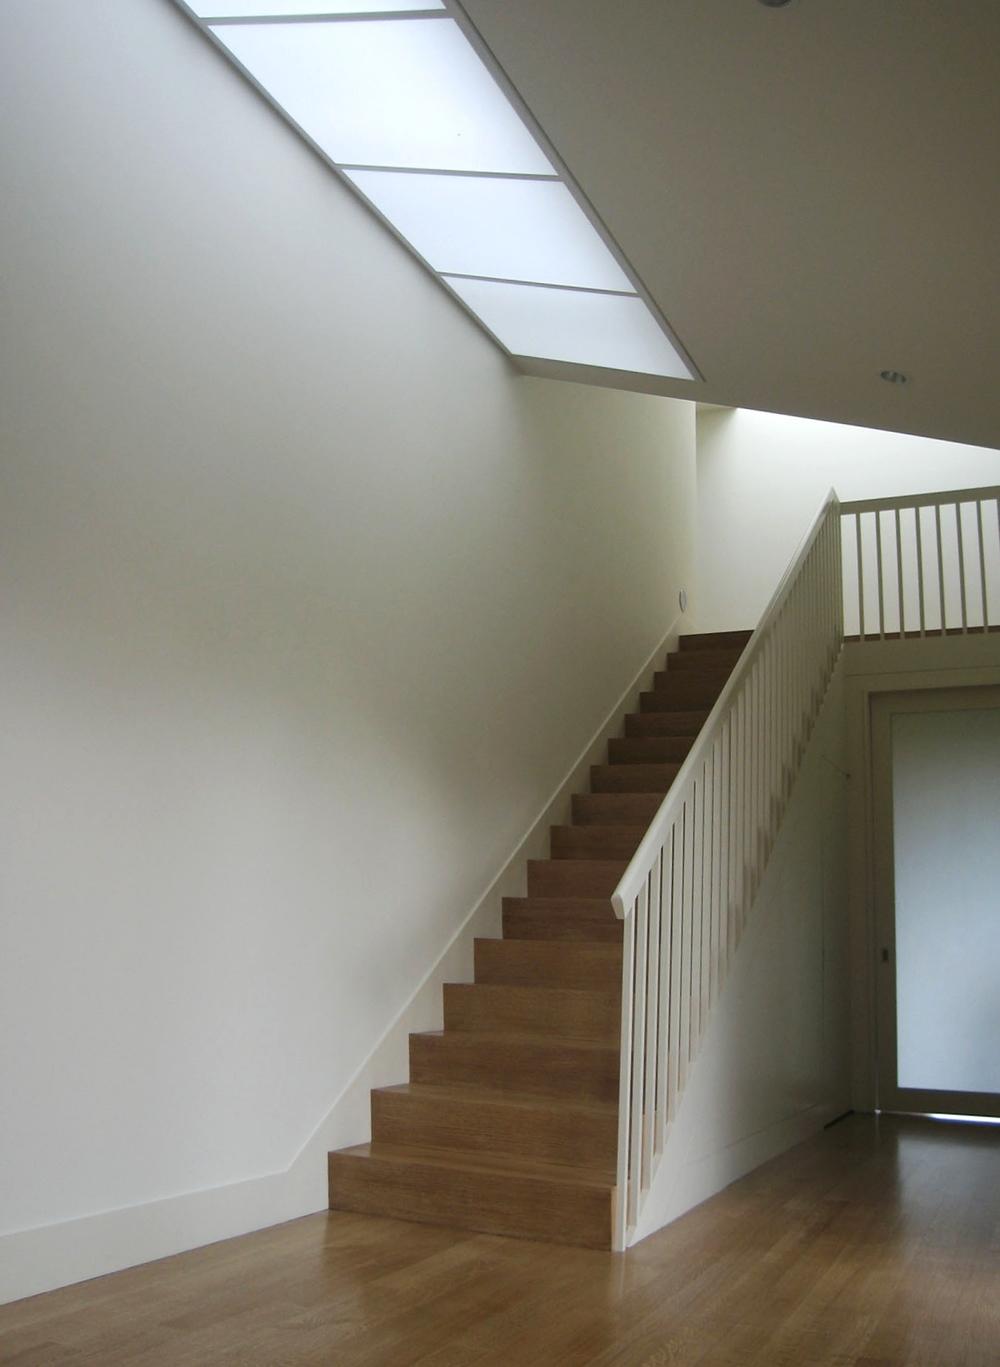 benton stair.jpg